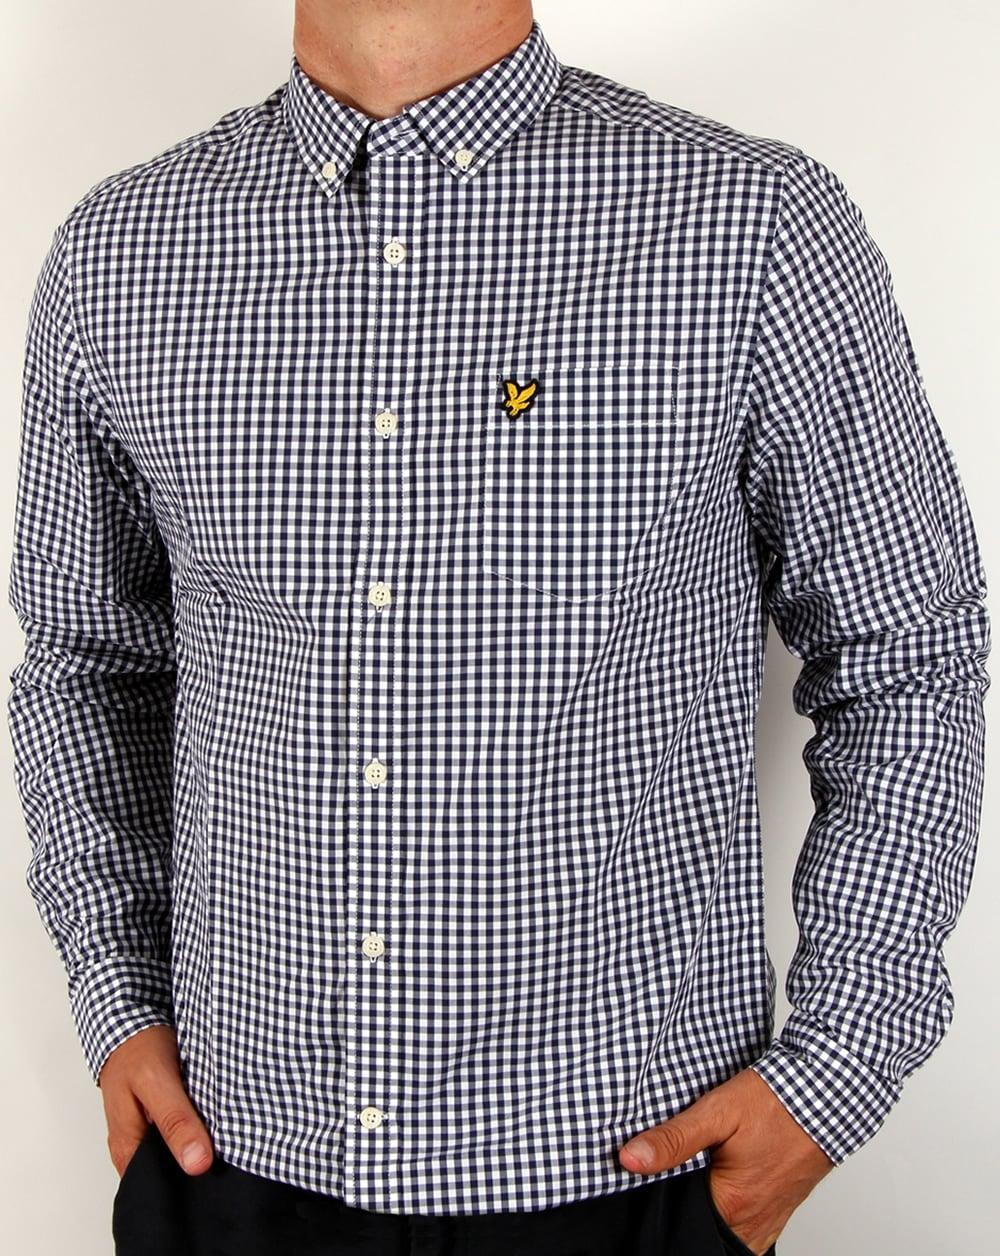 Navy Gingham Shirt Mens